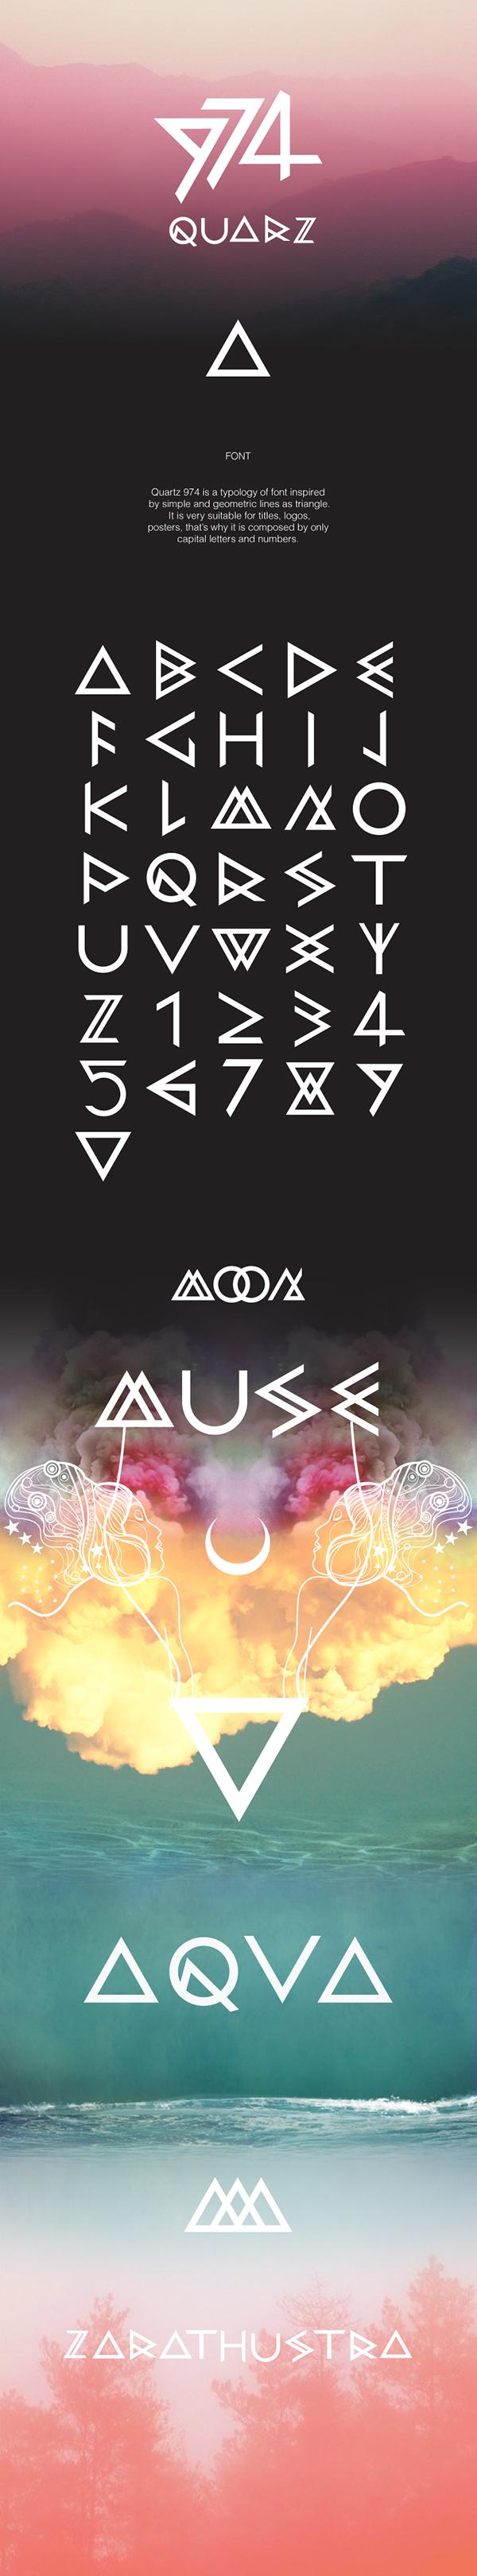 font typo domenico ruffo quarz cool quarz 974 triangle geometric minimal Style Hipster hipster style free freedom